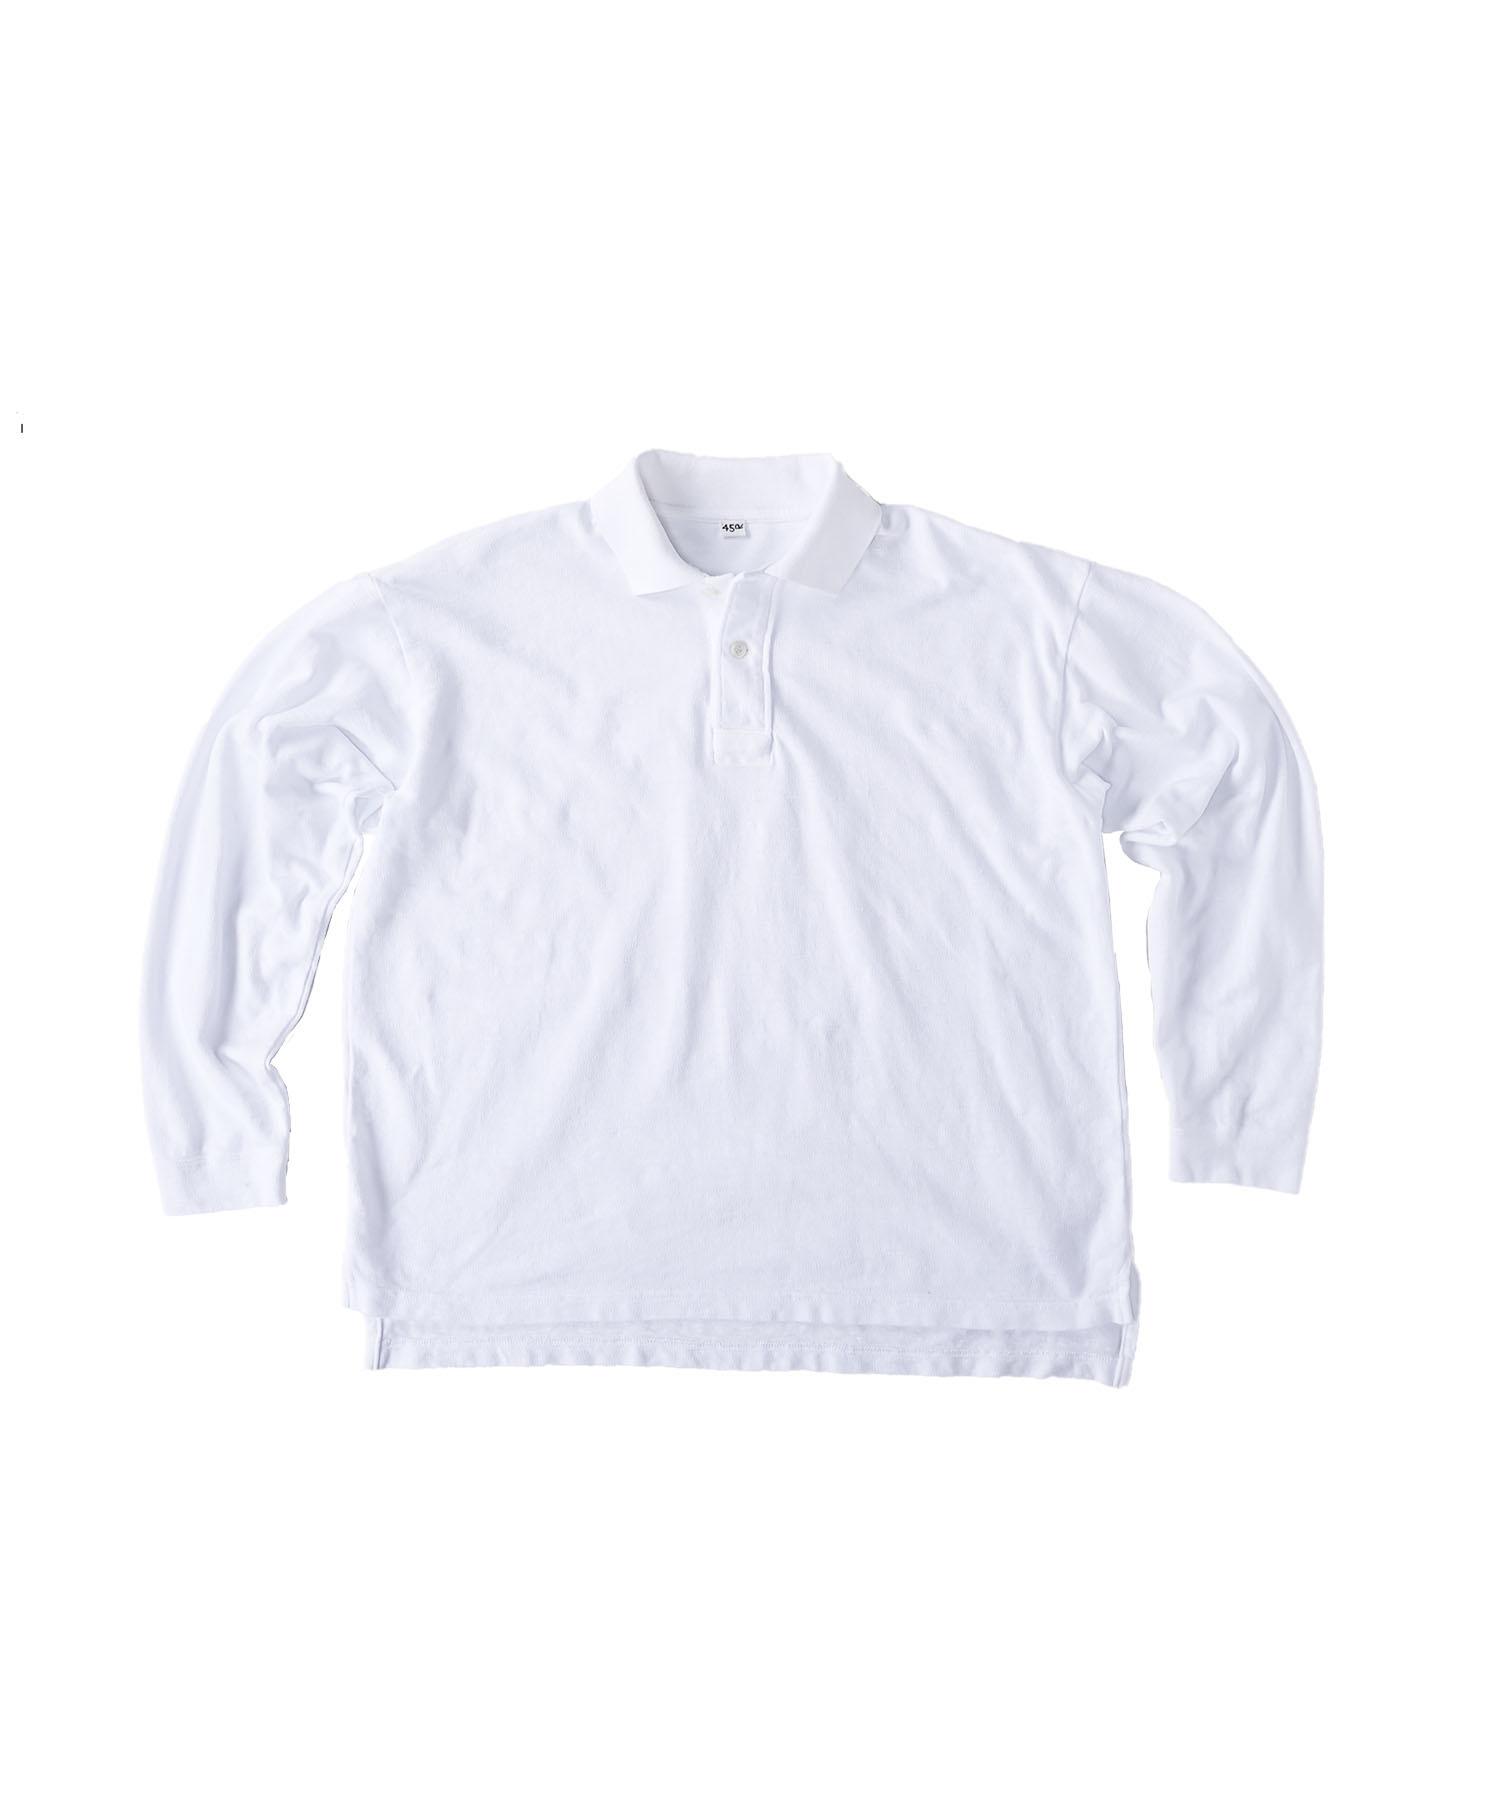 Kanoko Ocean Shiokaze Long-sleeved Polo Shirt (0421)-1